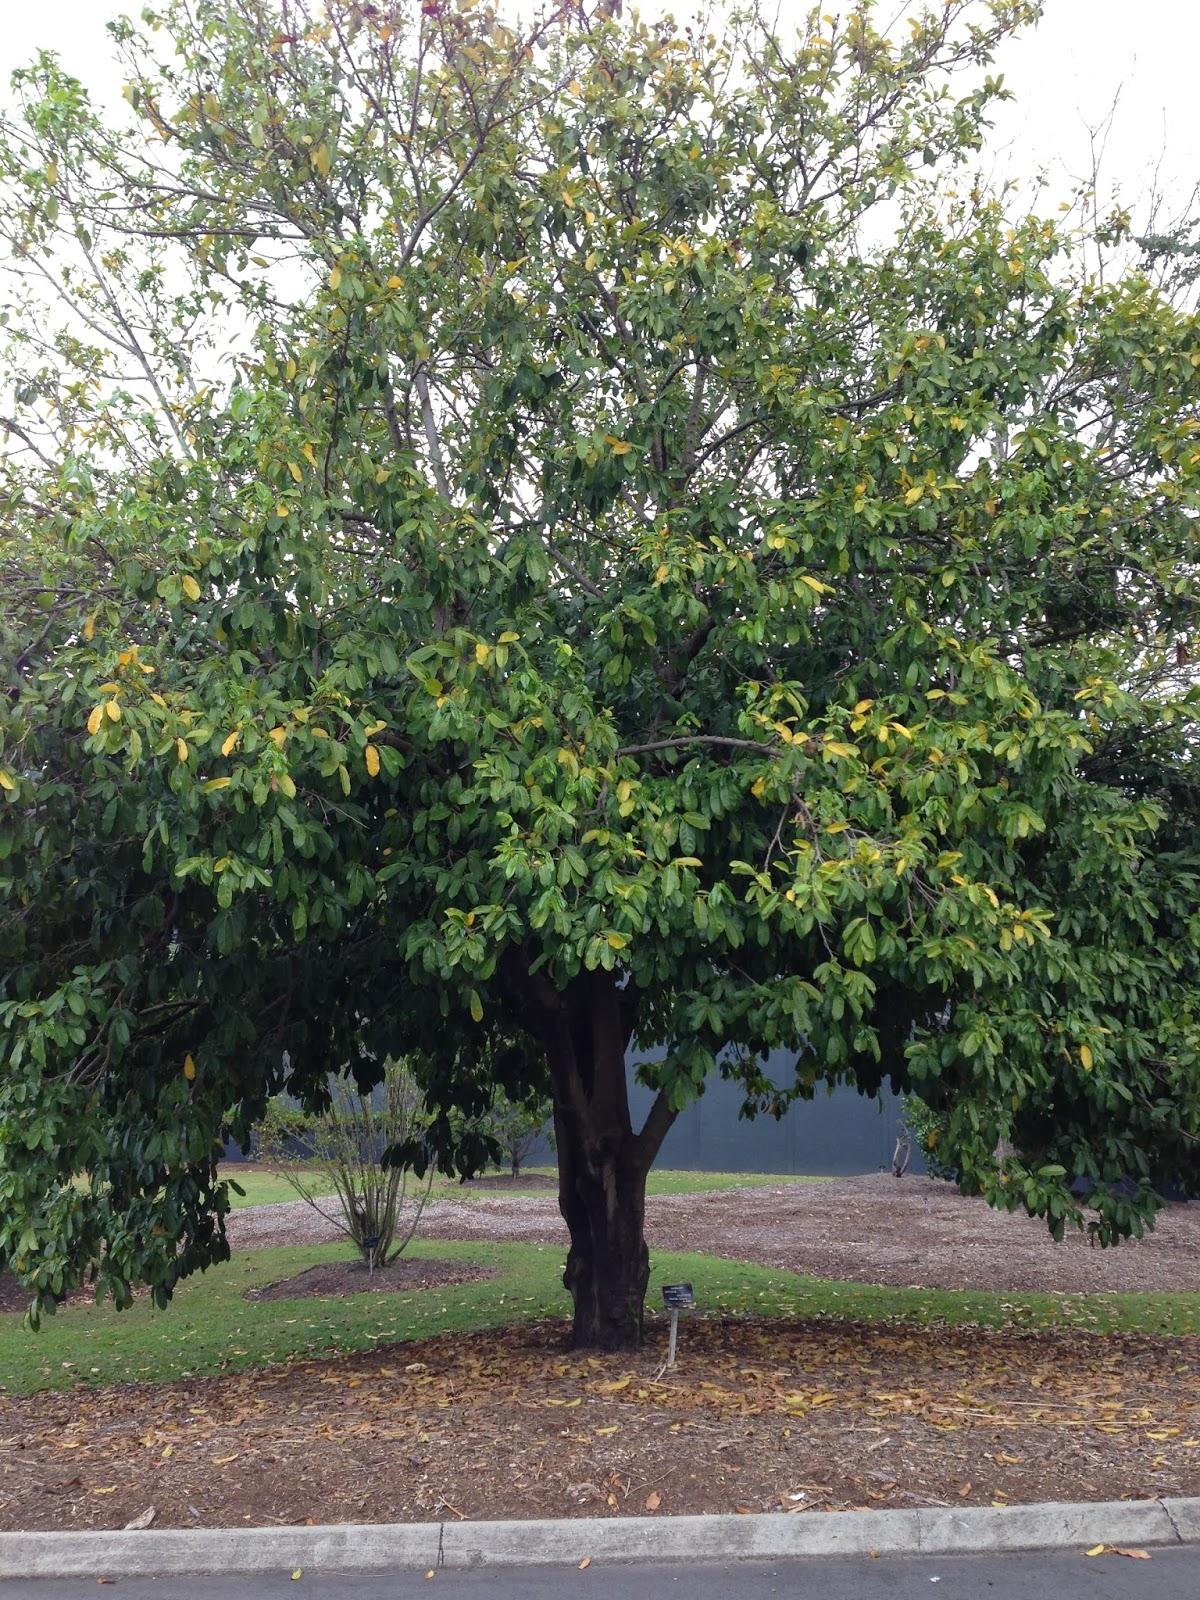 Daleys Fruit Tree Blog: Soursop Tree for Sale in Australia